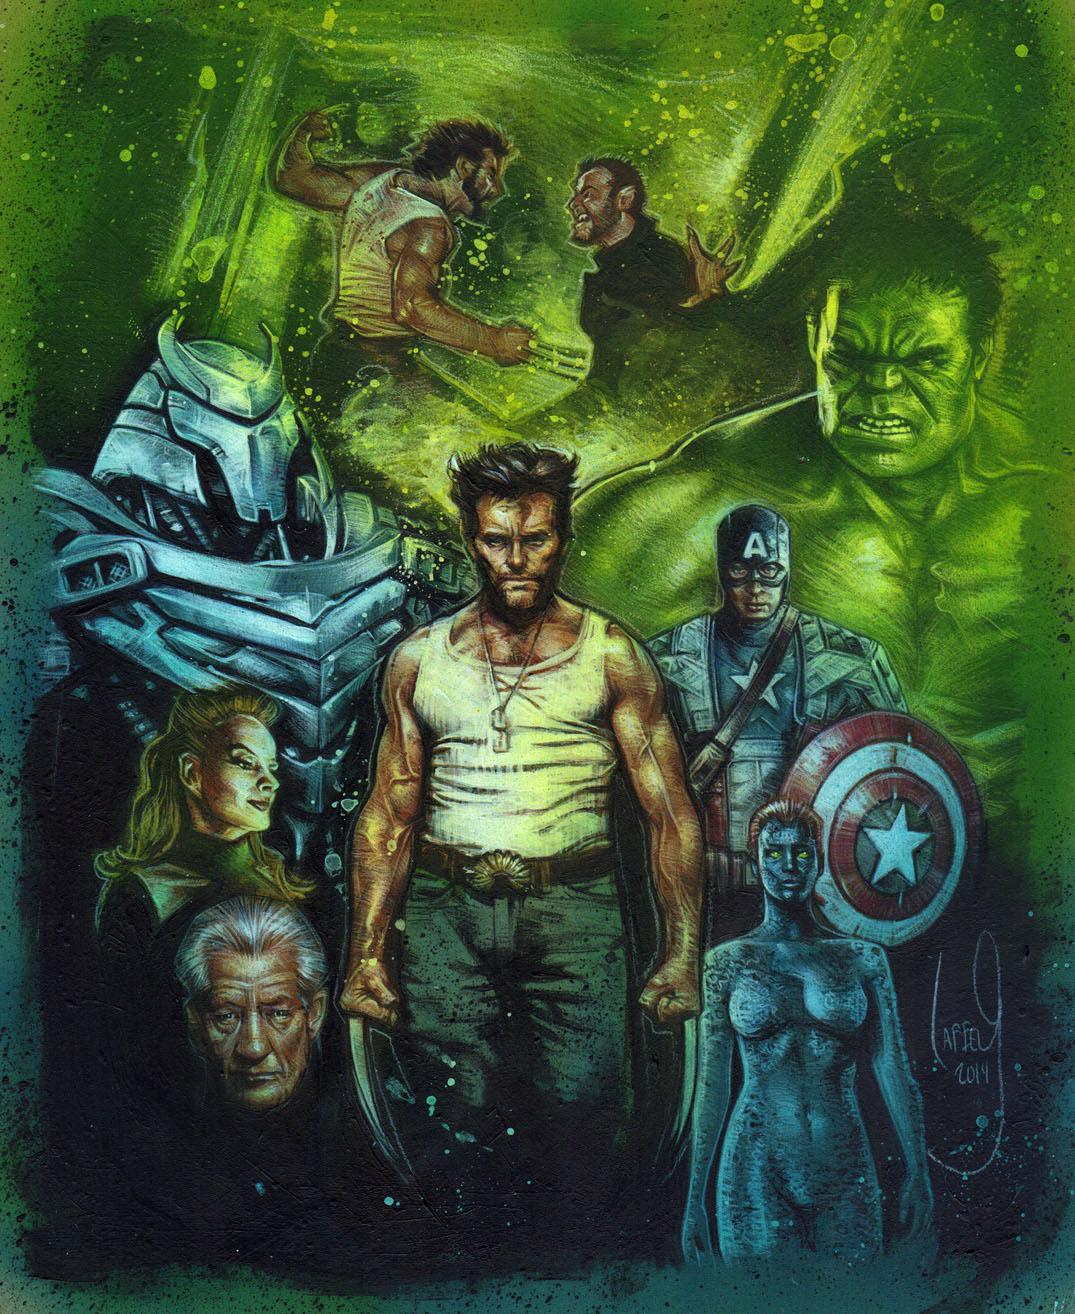 Hugh Jackman Wolverine, Artwork is Copyright © 2014 Jeff Lafferty